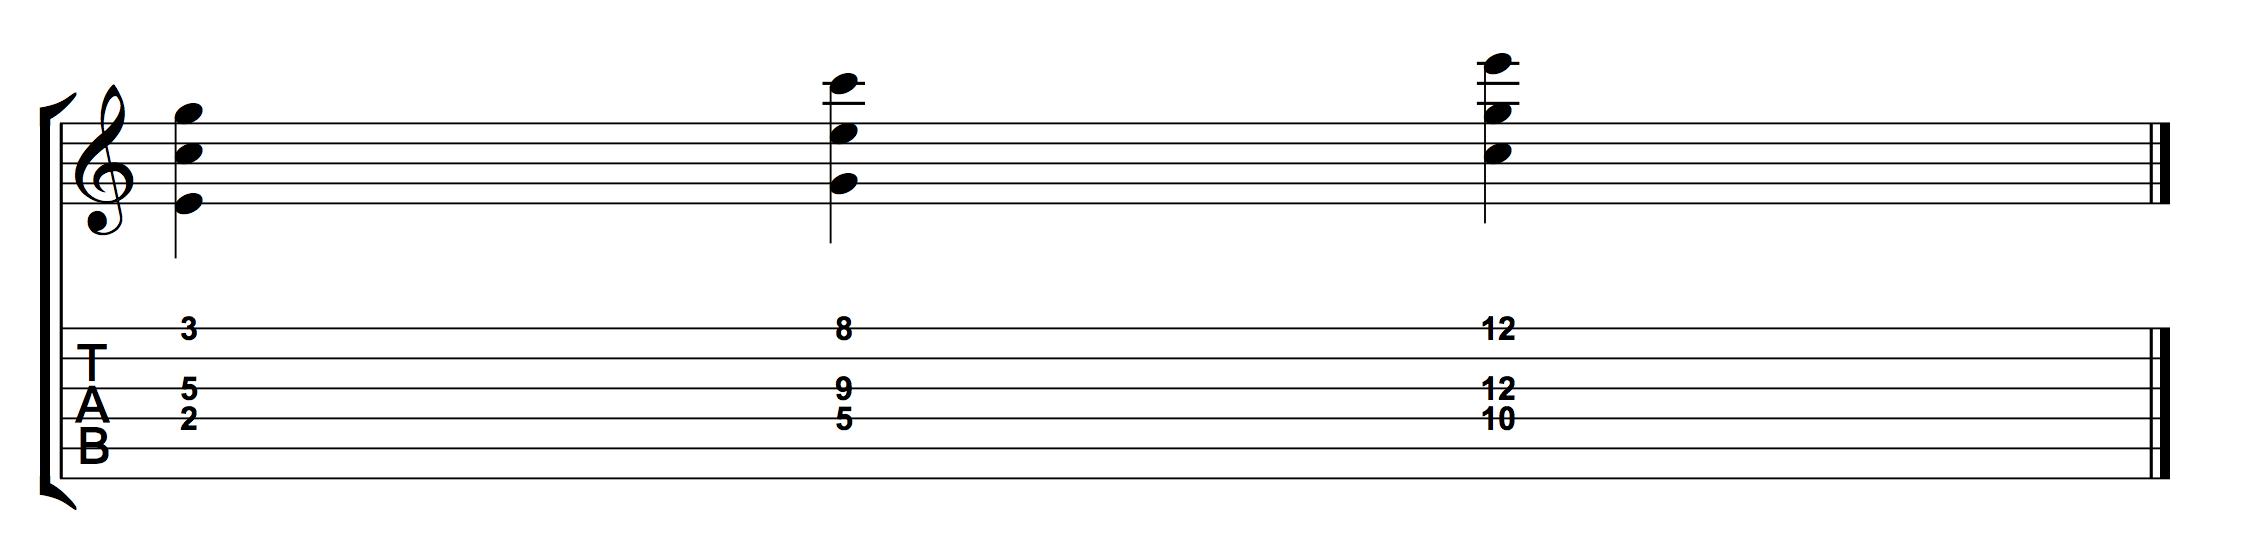 C Major Triad 3 Shapes 134